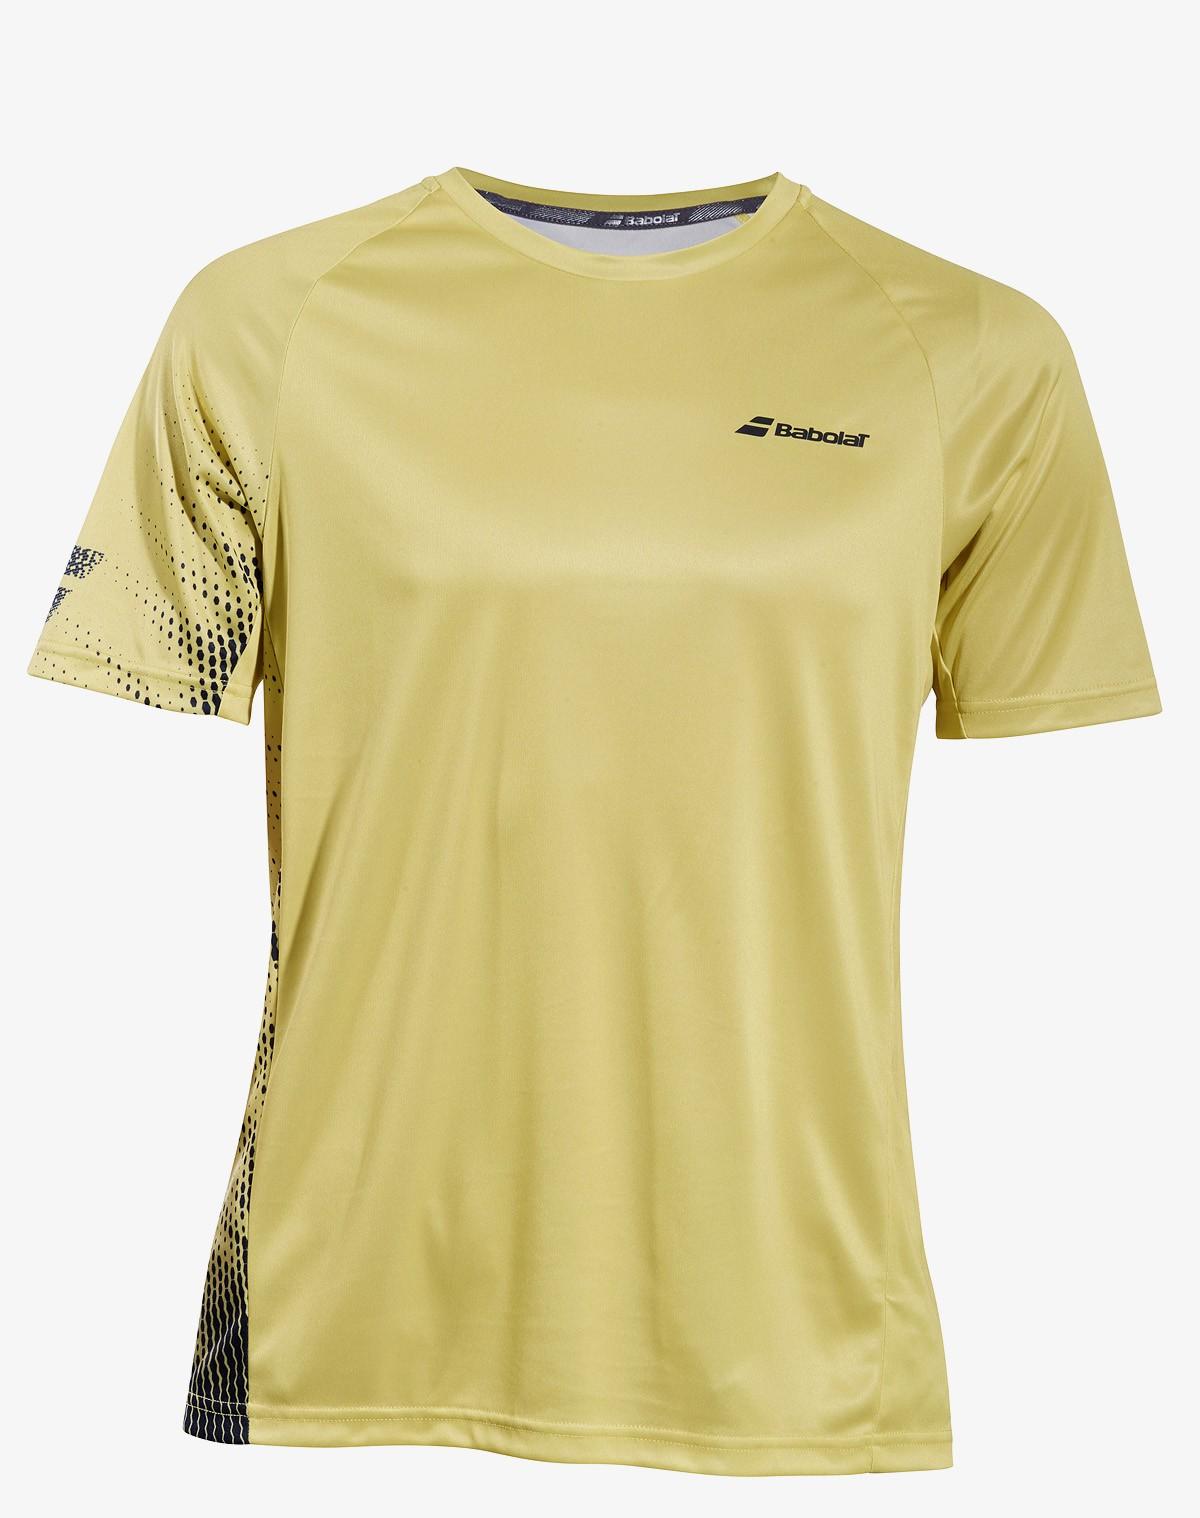 Koszulka tenisowa chłopięca Babolat PERF T-shirt Yellow -45%